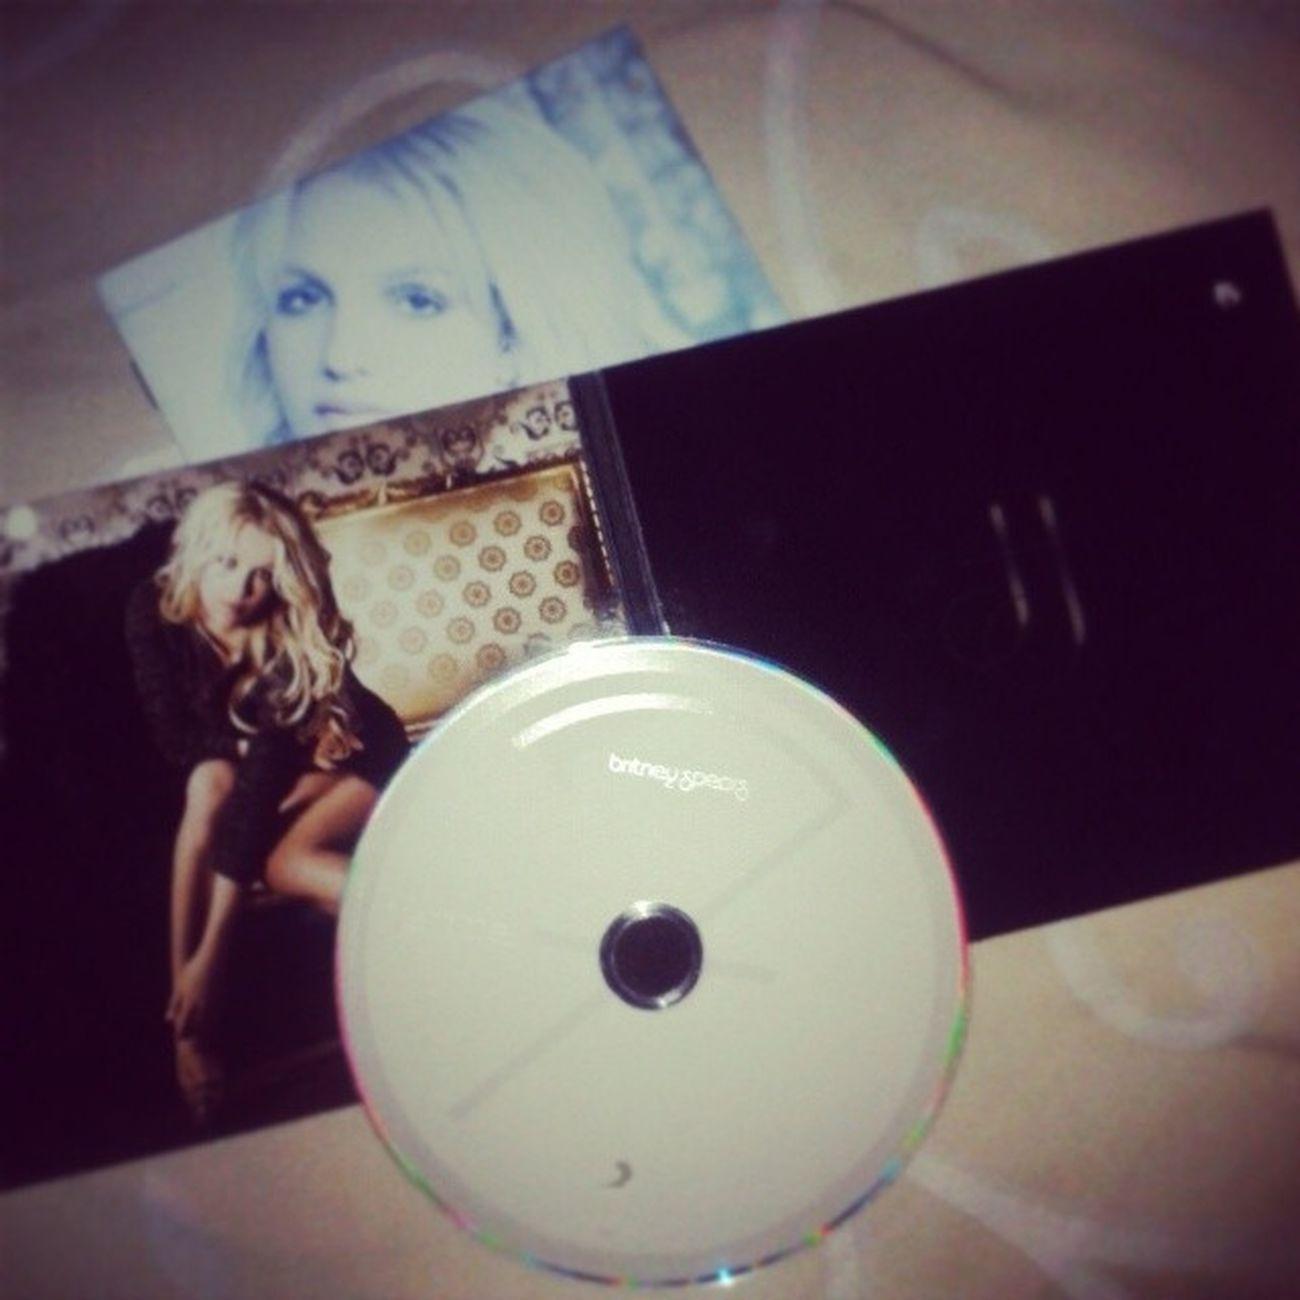 Listening... Femmefatale Album Holditagainstme Upndown scary britneyspears 2011 barmy